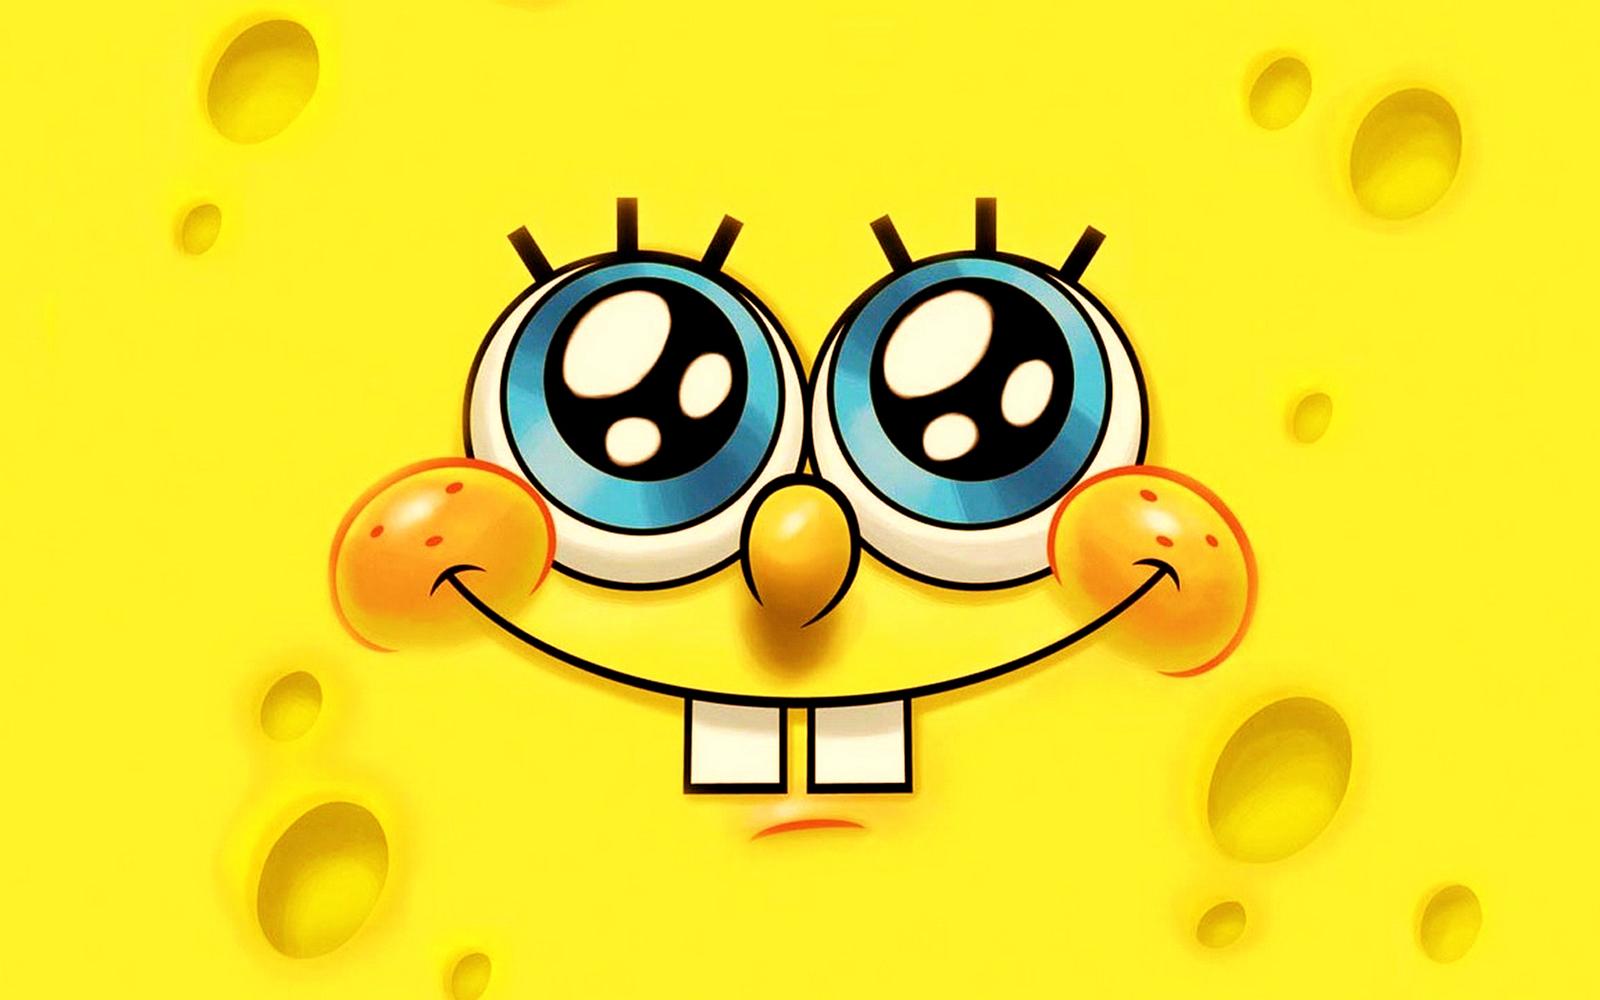 SpongeBob Square Pants HD Wallpapers Download Wallpapers in HD 1600x1000